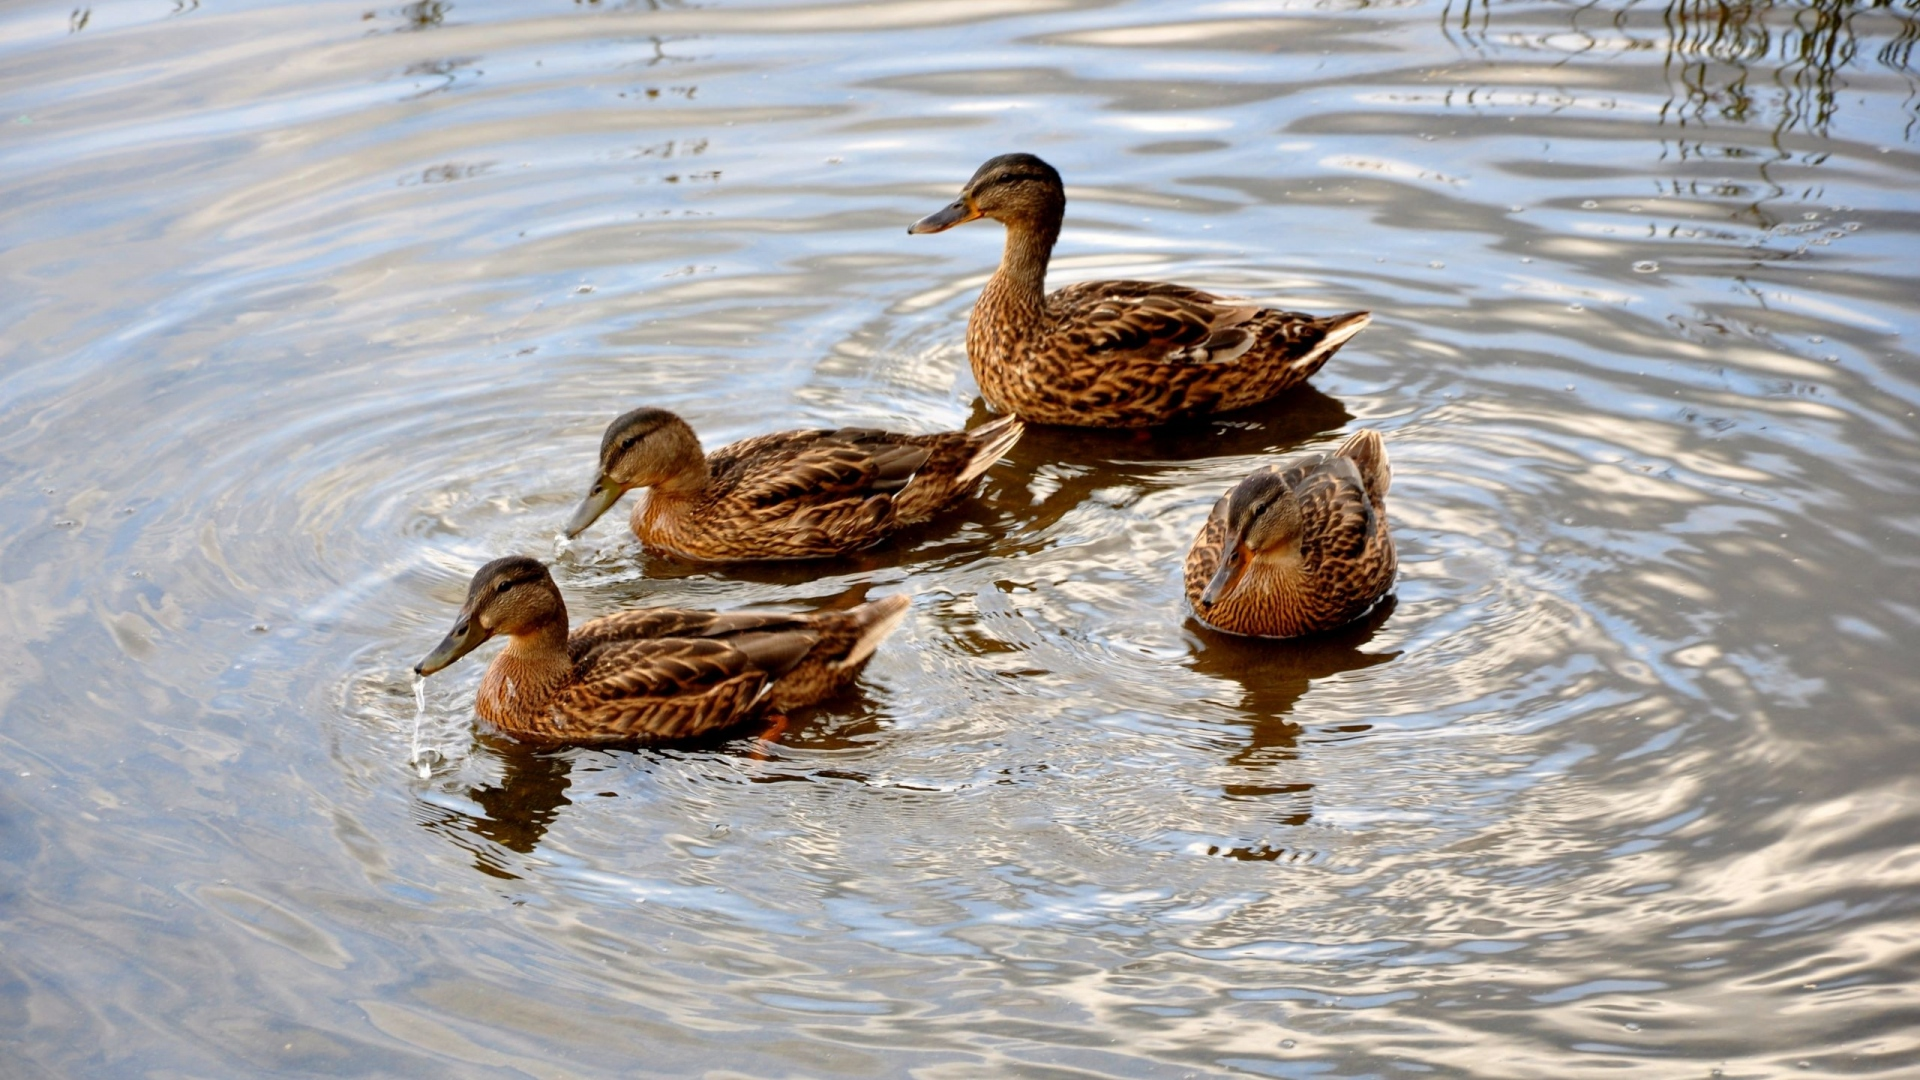 Download Wallpaper 1920x1080 ducks, lake, swimming, family ...